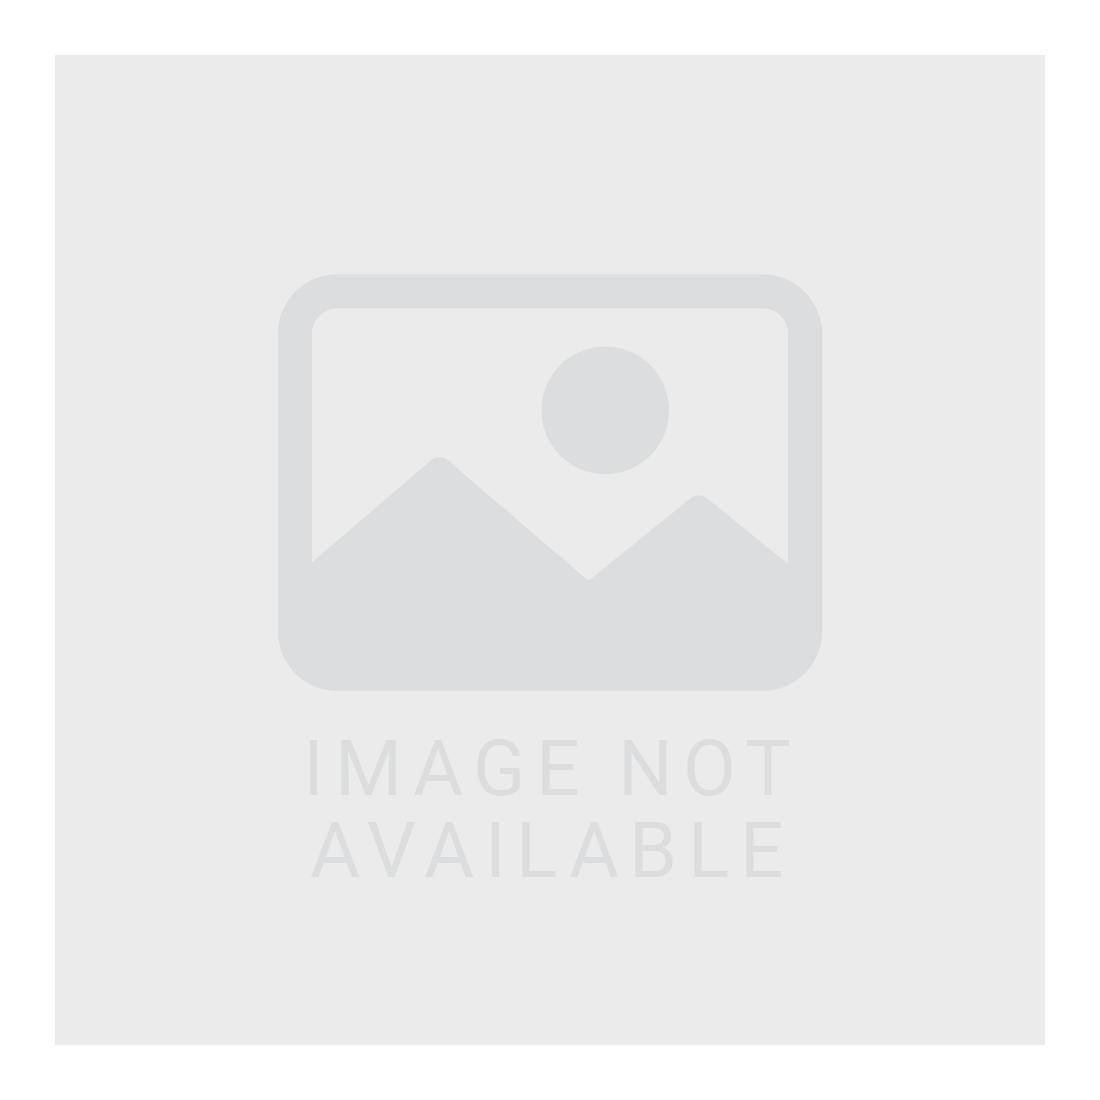 Men's New Era Heritage Blend Varsity T-shirt